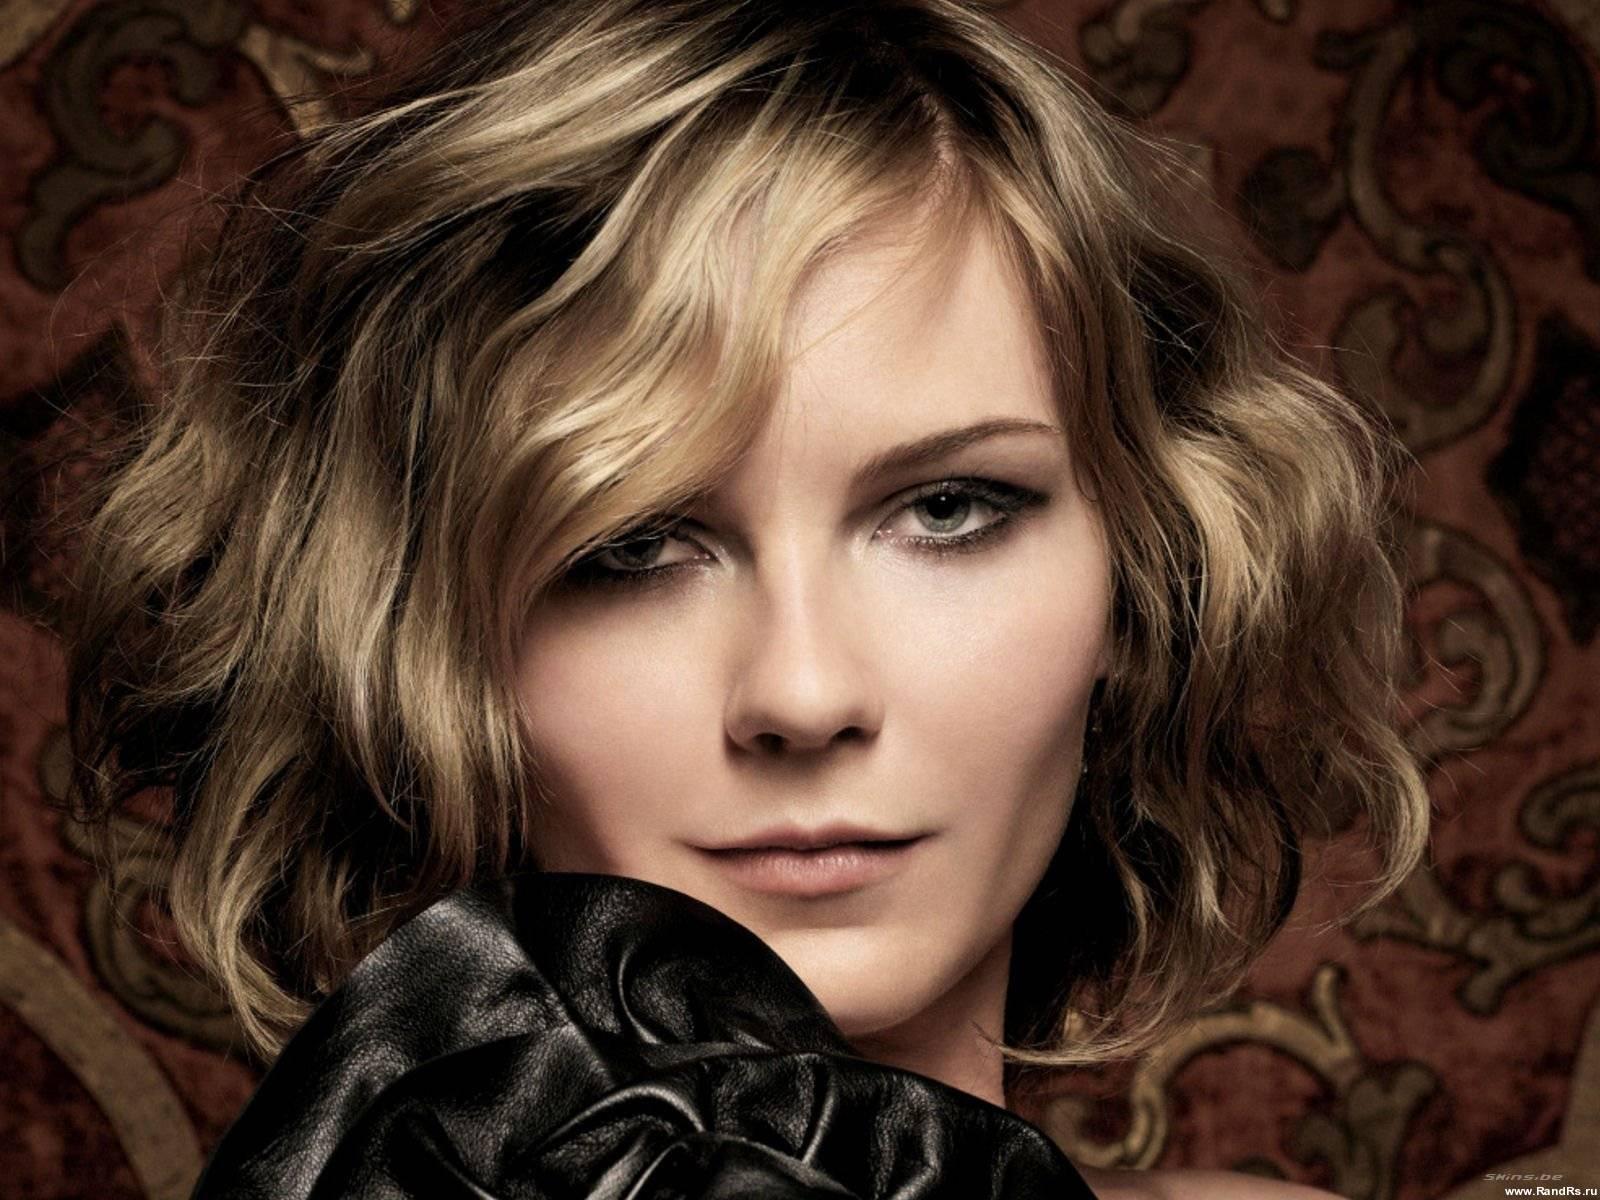 Beautiful Women Faces Wallpaper - WallpaperSafari - photo#29